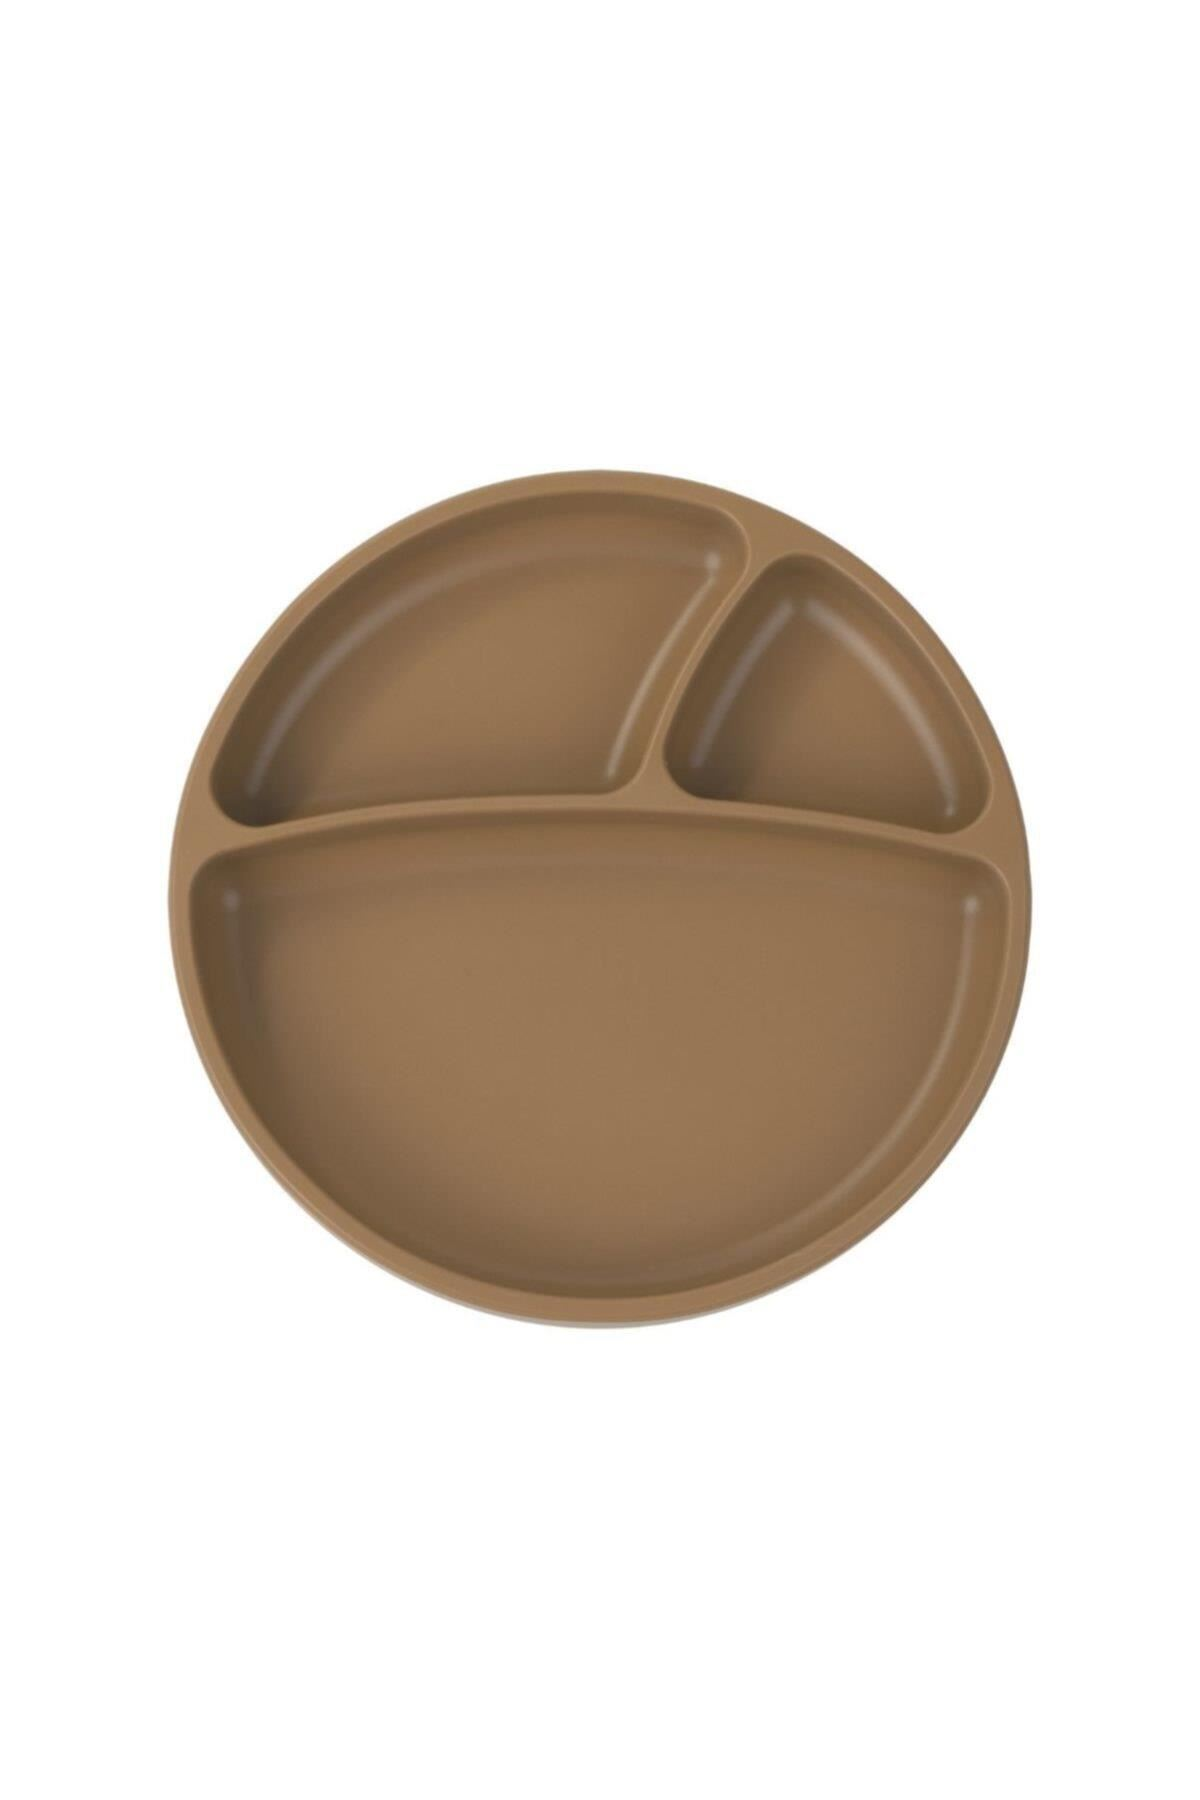 OiOi Porsiyon Vakum Tabanlı Silikon Tabak Brown